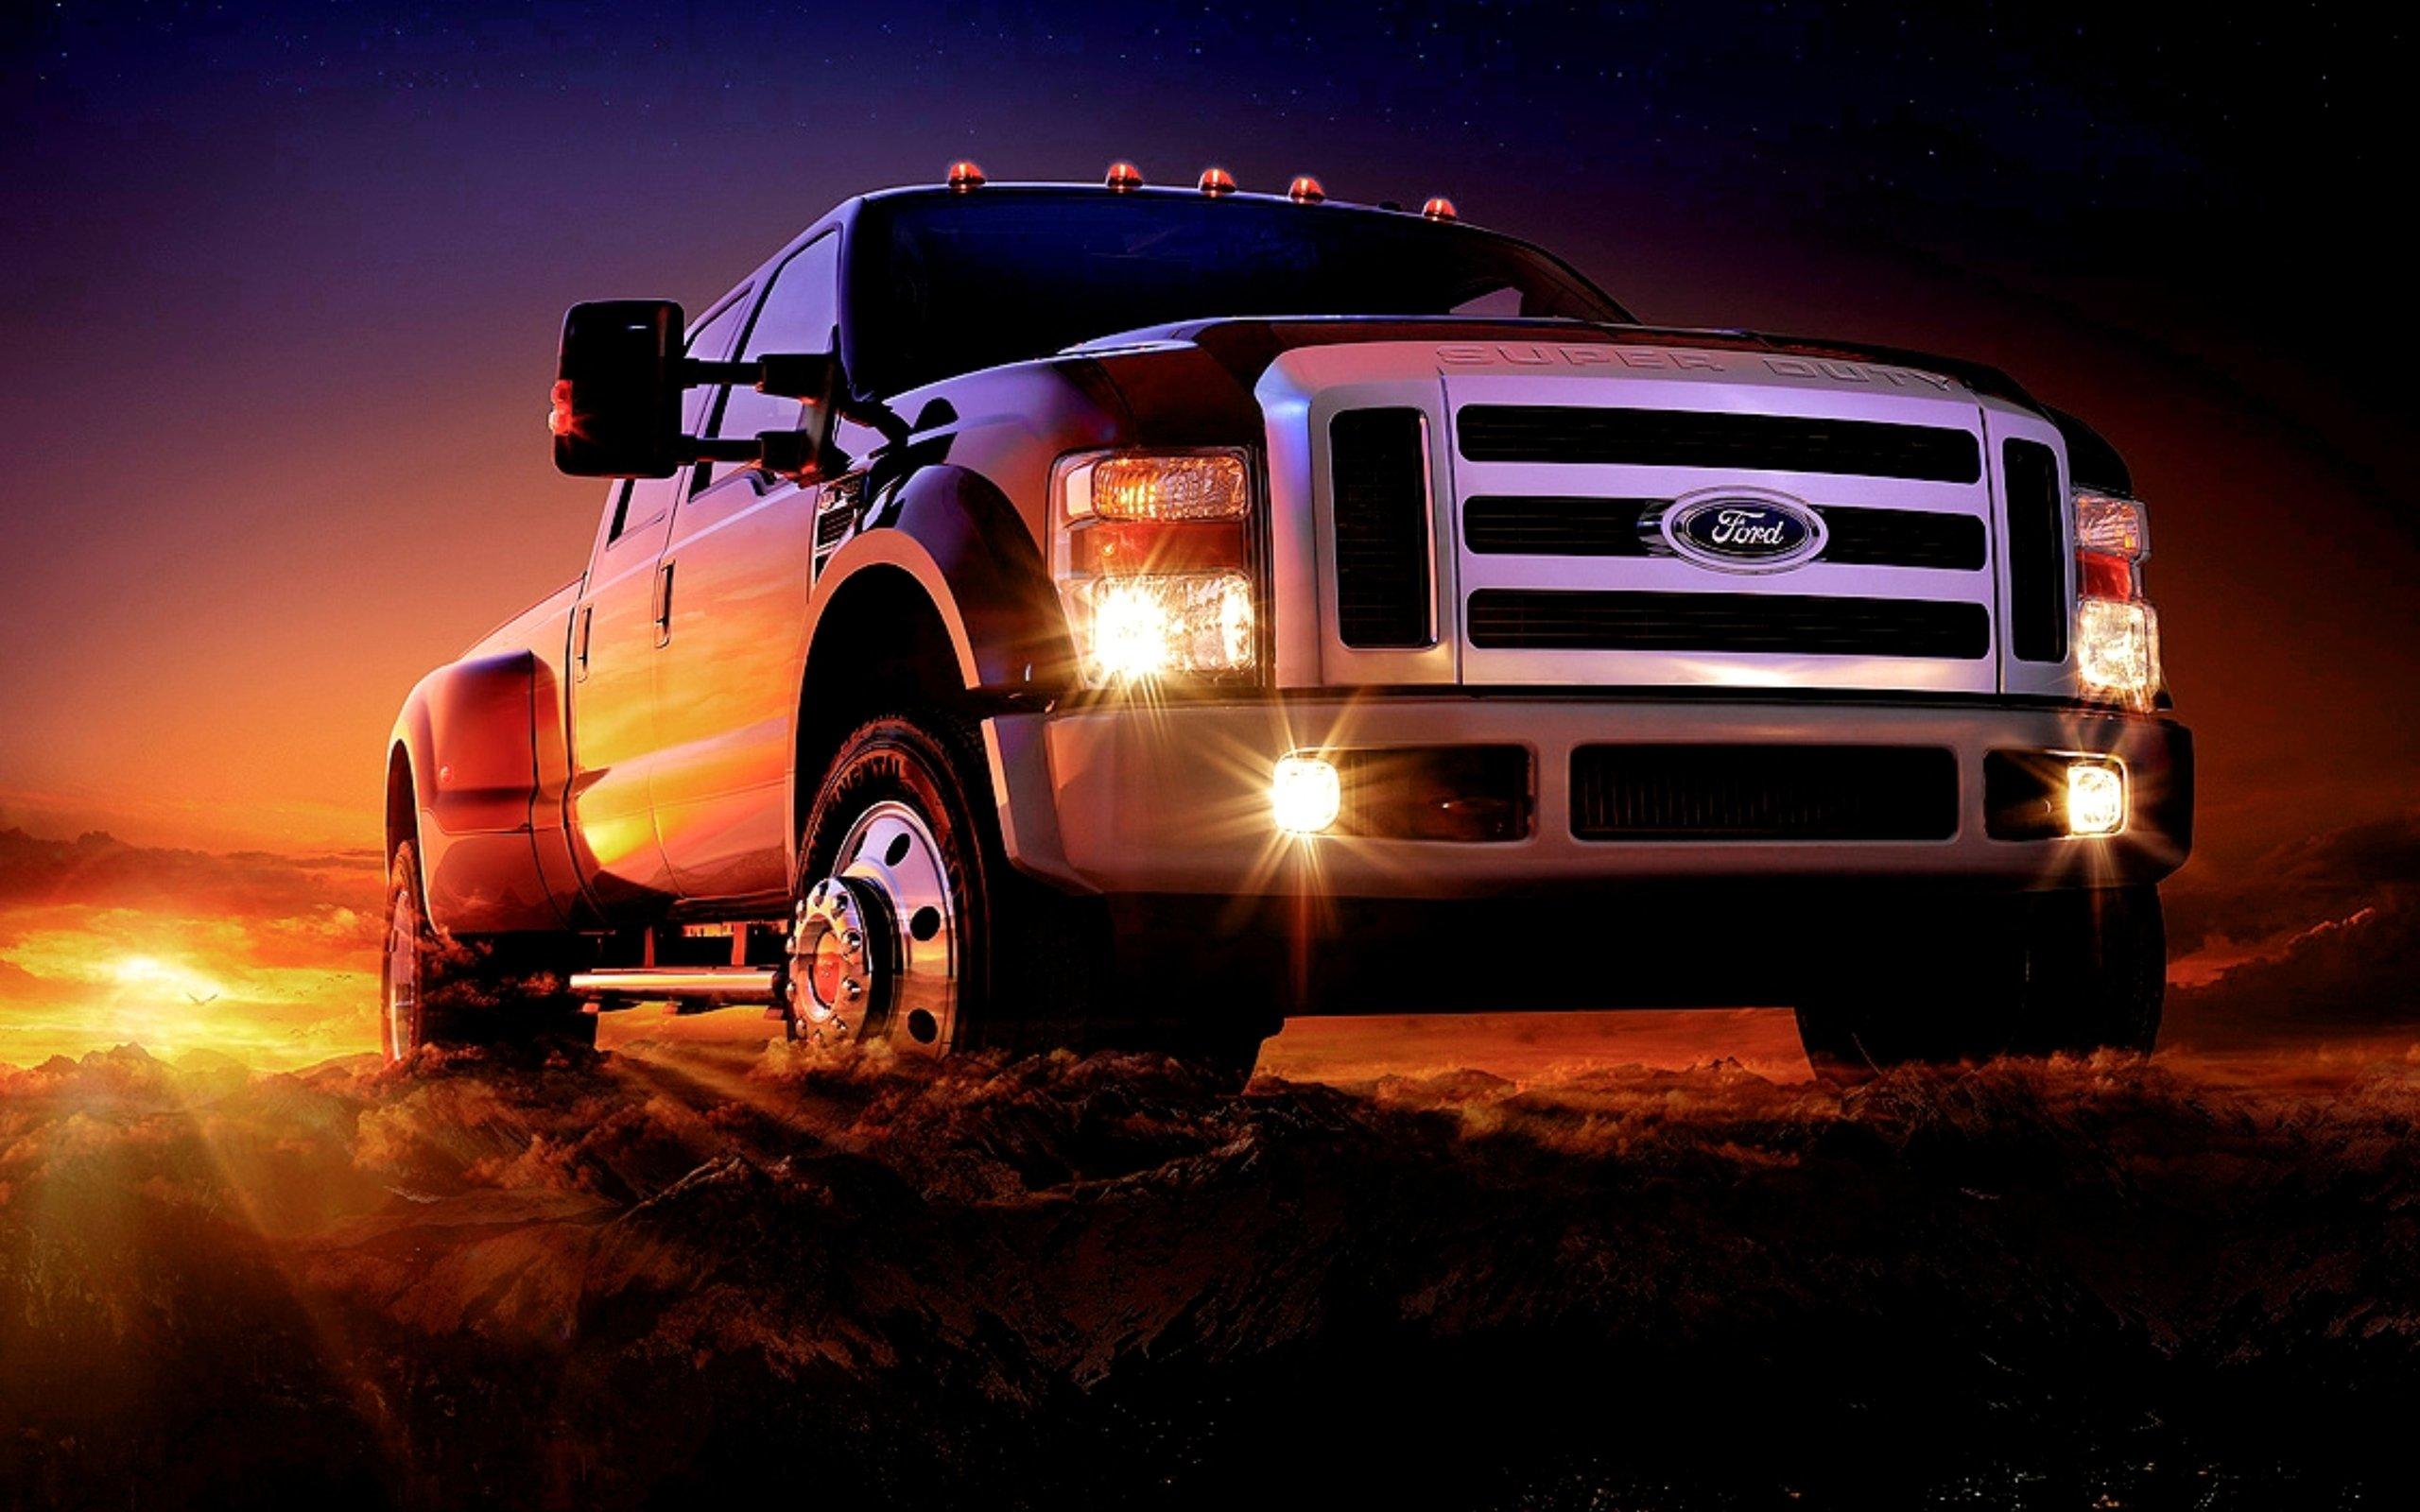 Ford Truck Hd Wallpaper Ford Truck Wallpapers Hd Pixelstalk Net